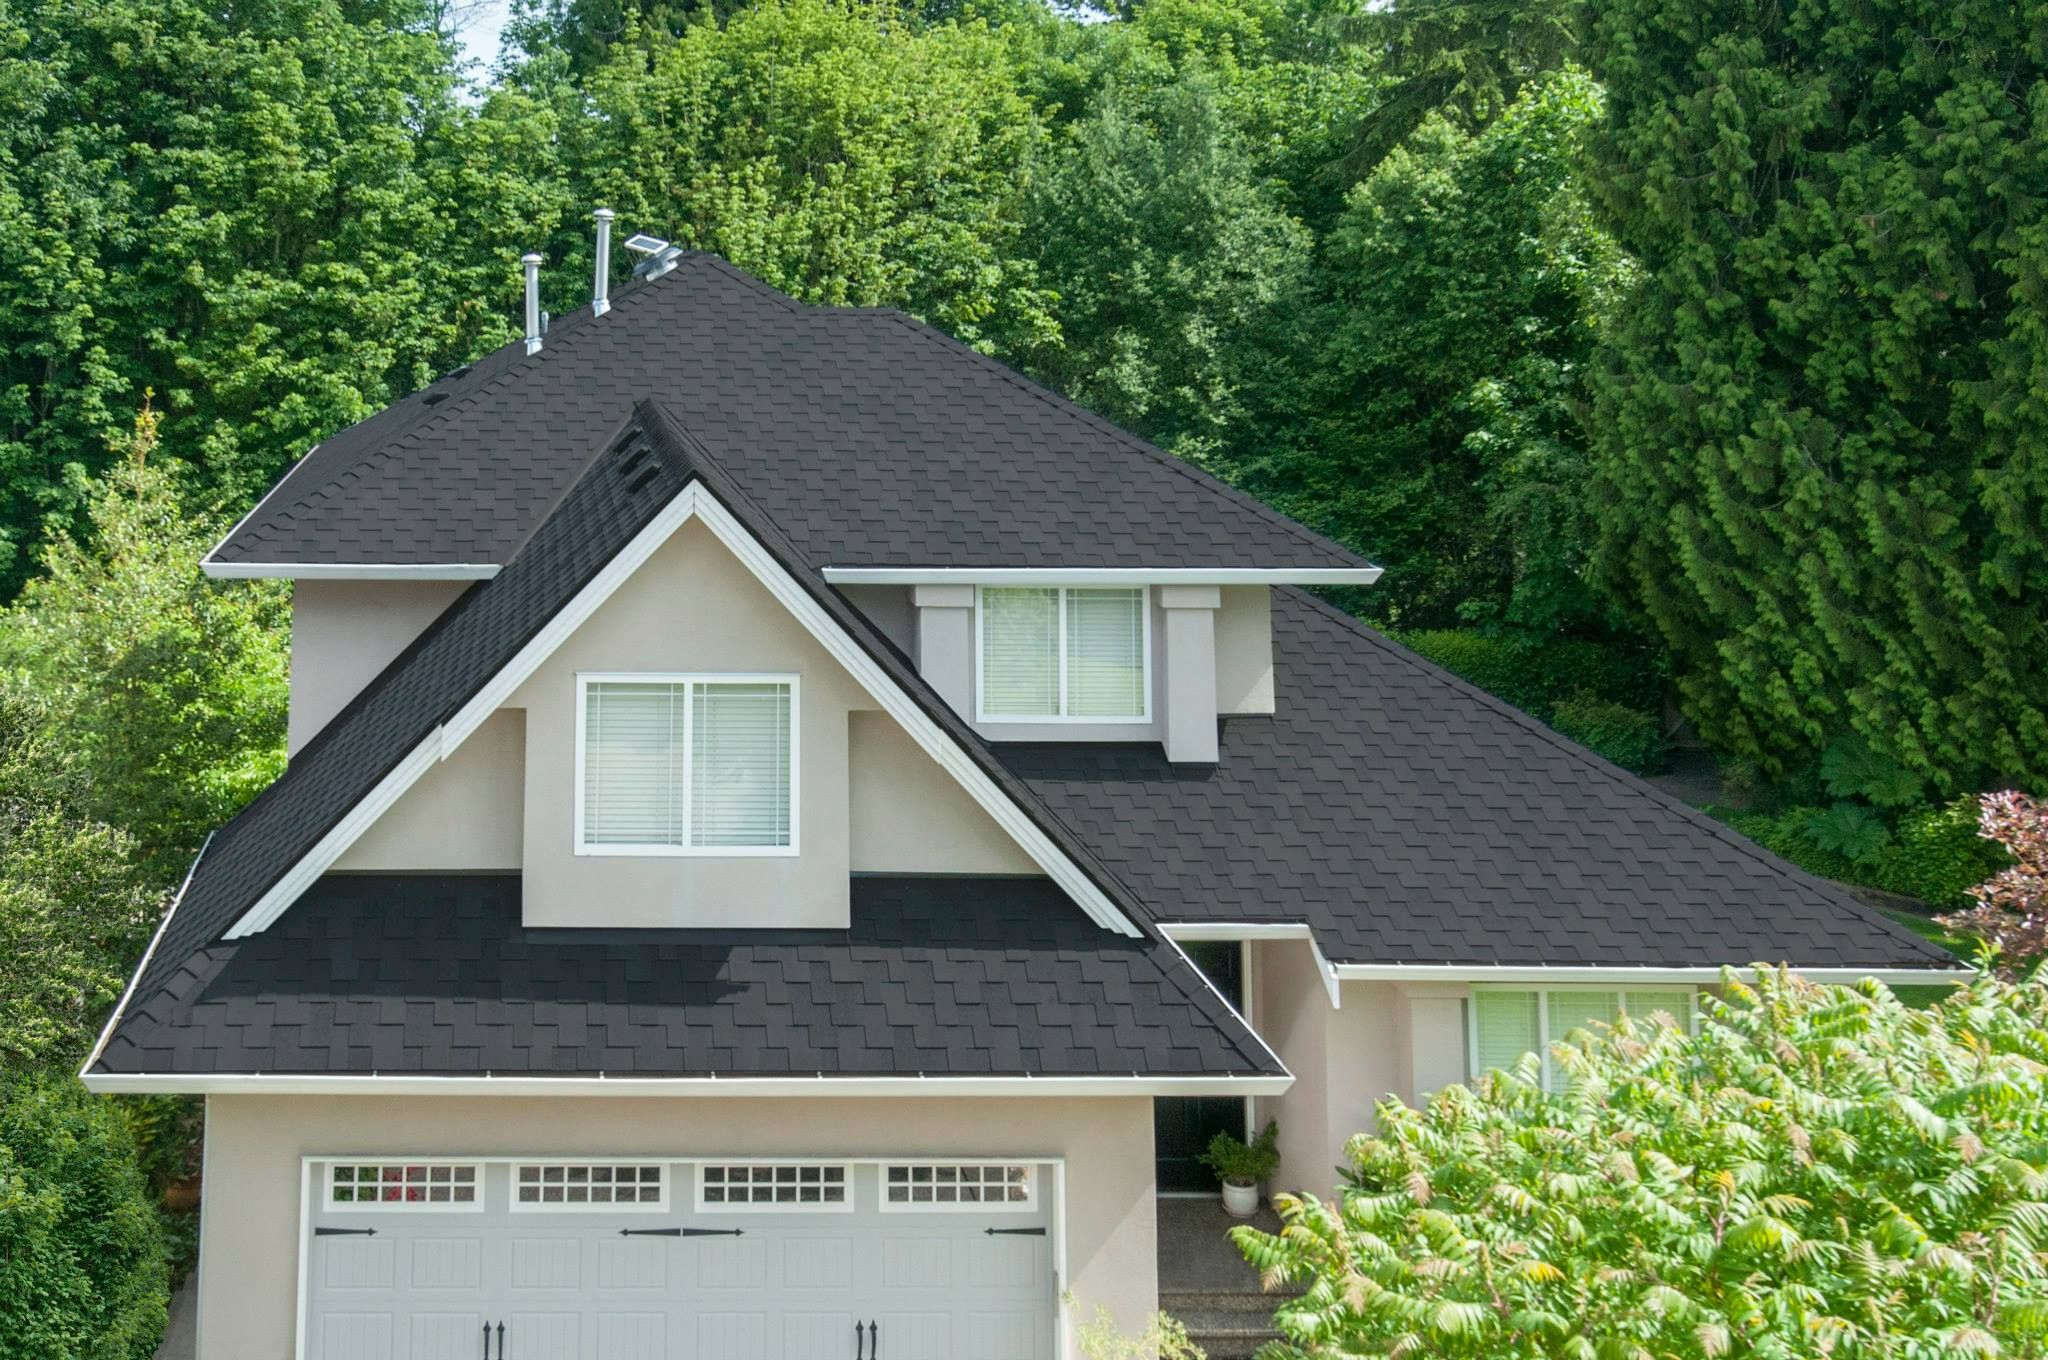 Beautiful Malarkey Roofing Products | Windsor Shingles | Midnight Black